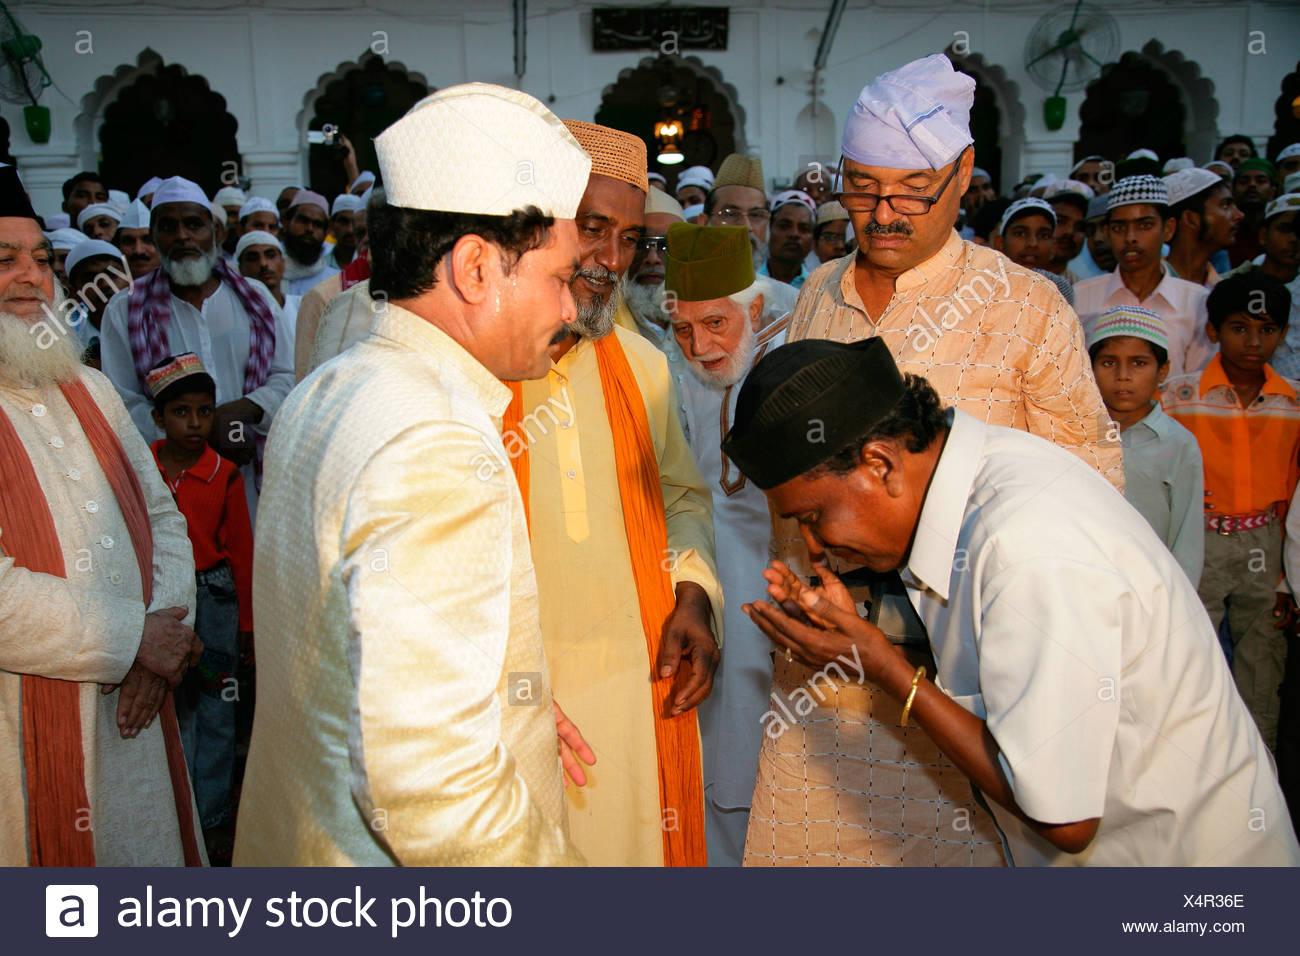 Muslim Wedding Stock Photos & Muslim Wedding Stock Images